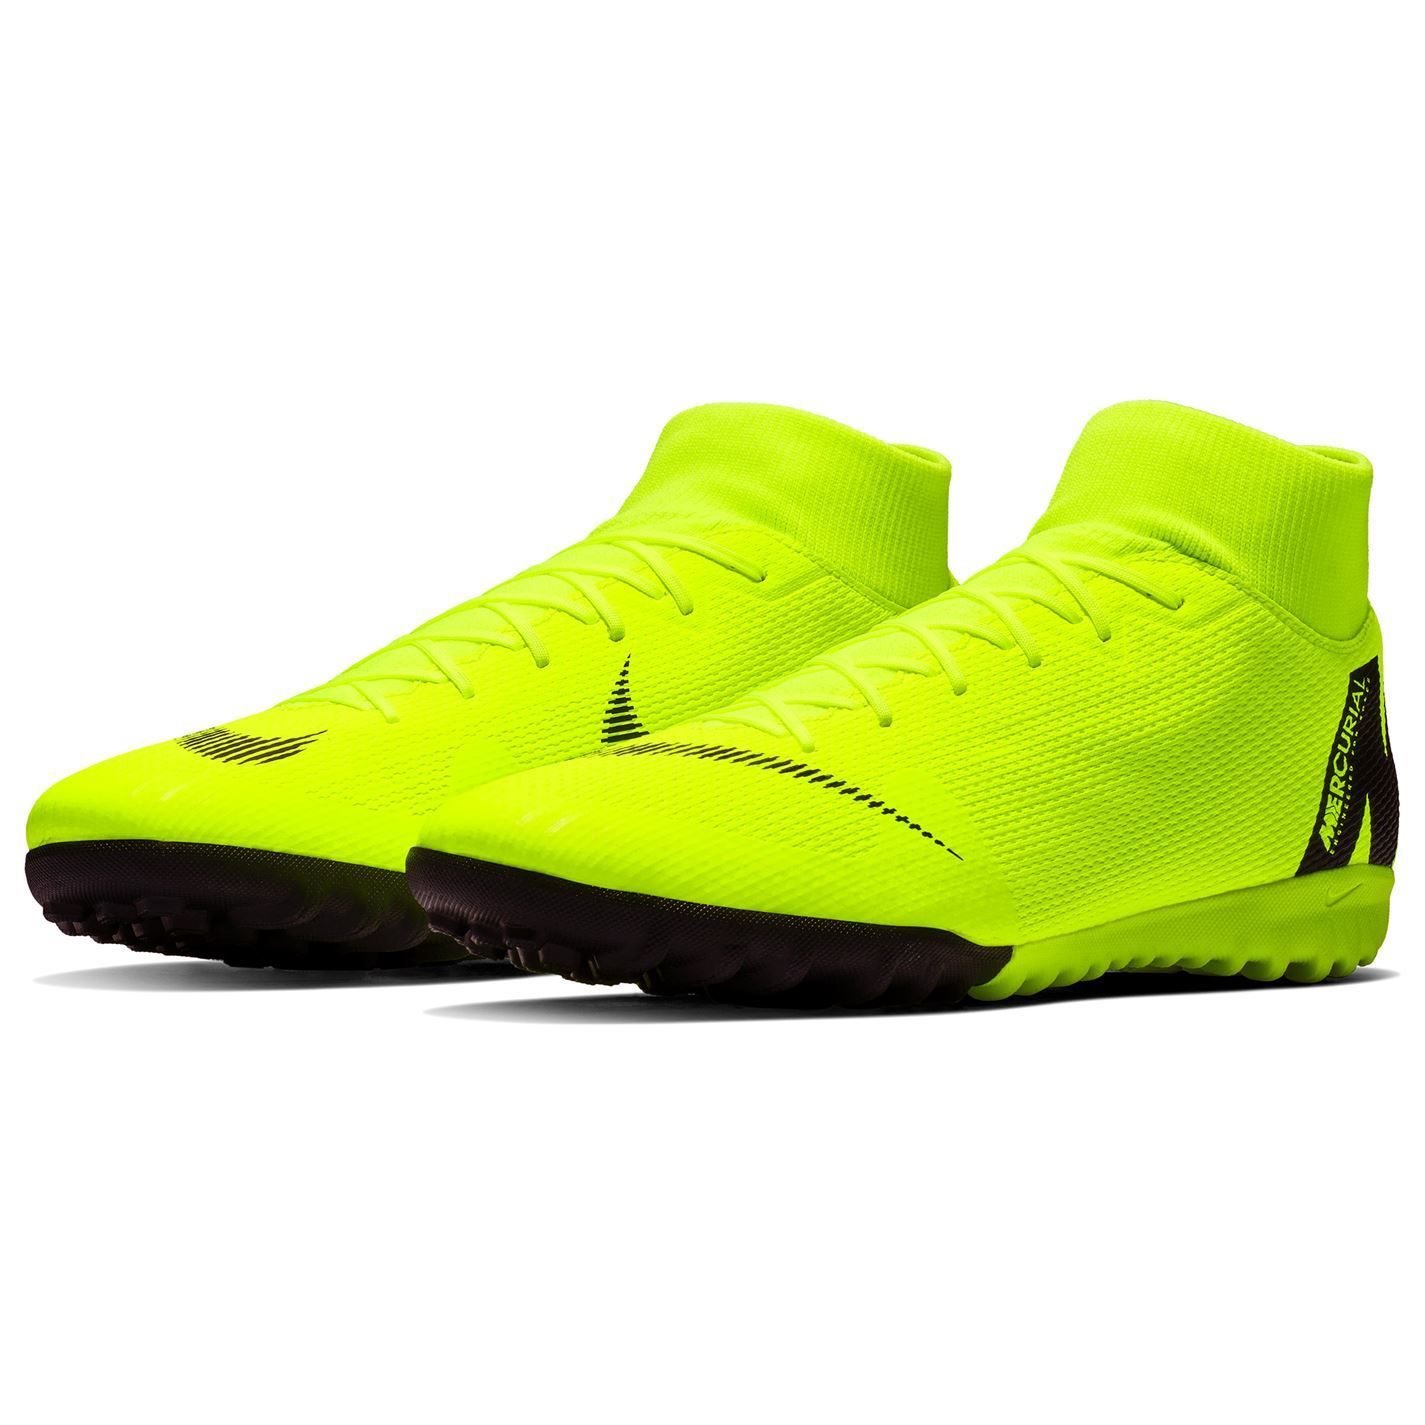 ... Nike Mercurial Superfly Academia DF Astro Turf fútbol entrenadores  hombres fútbol zapato ... d4aa96ccca4